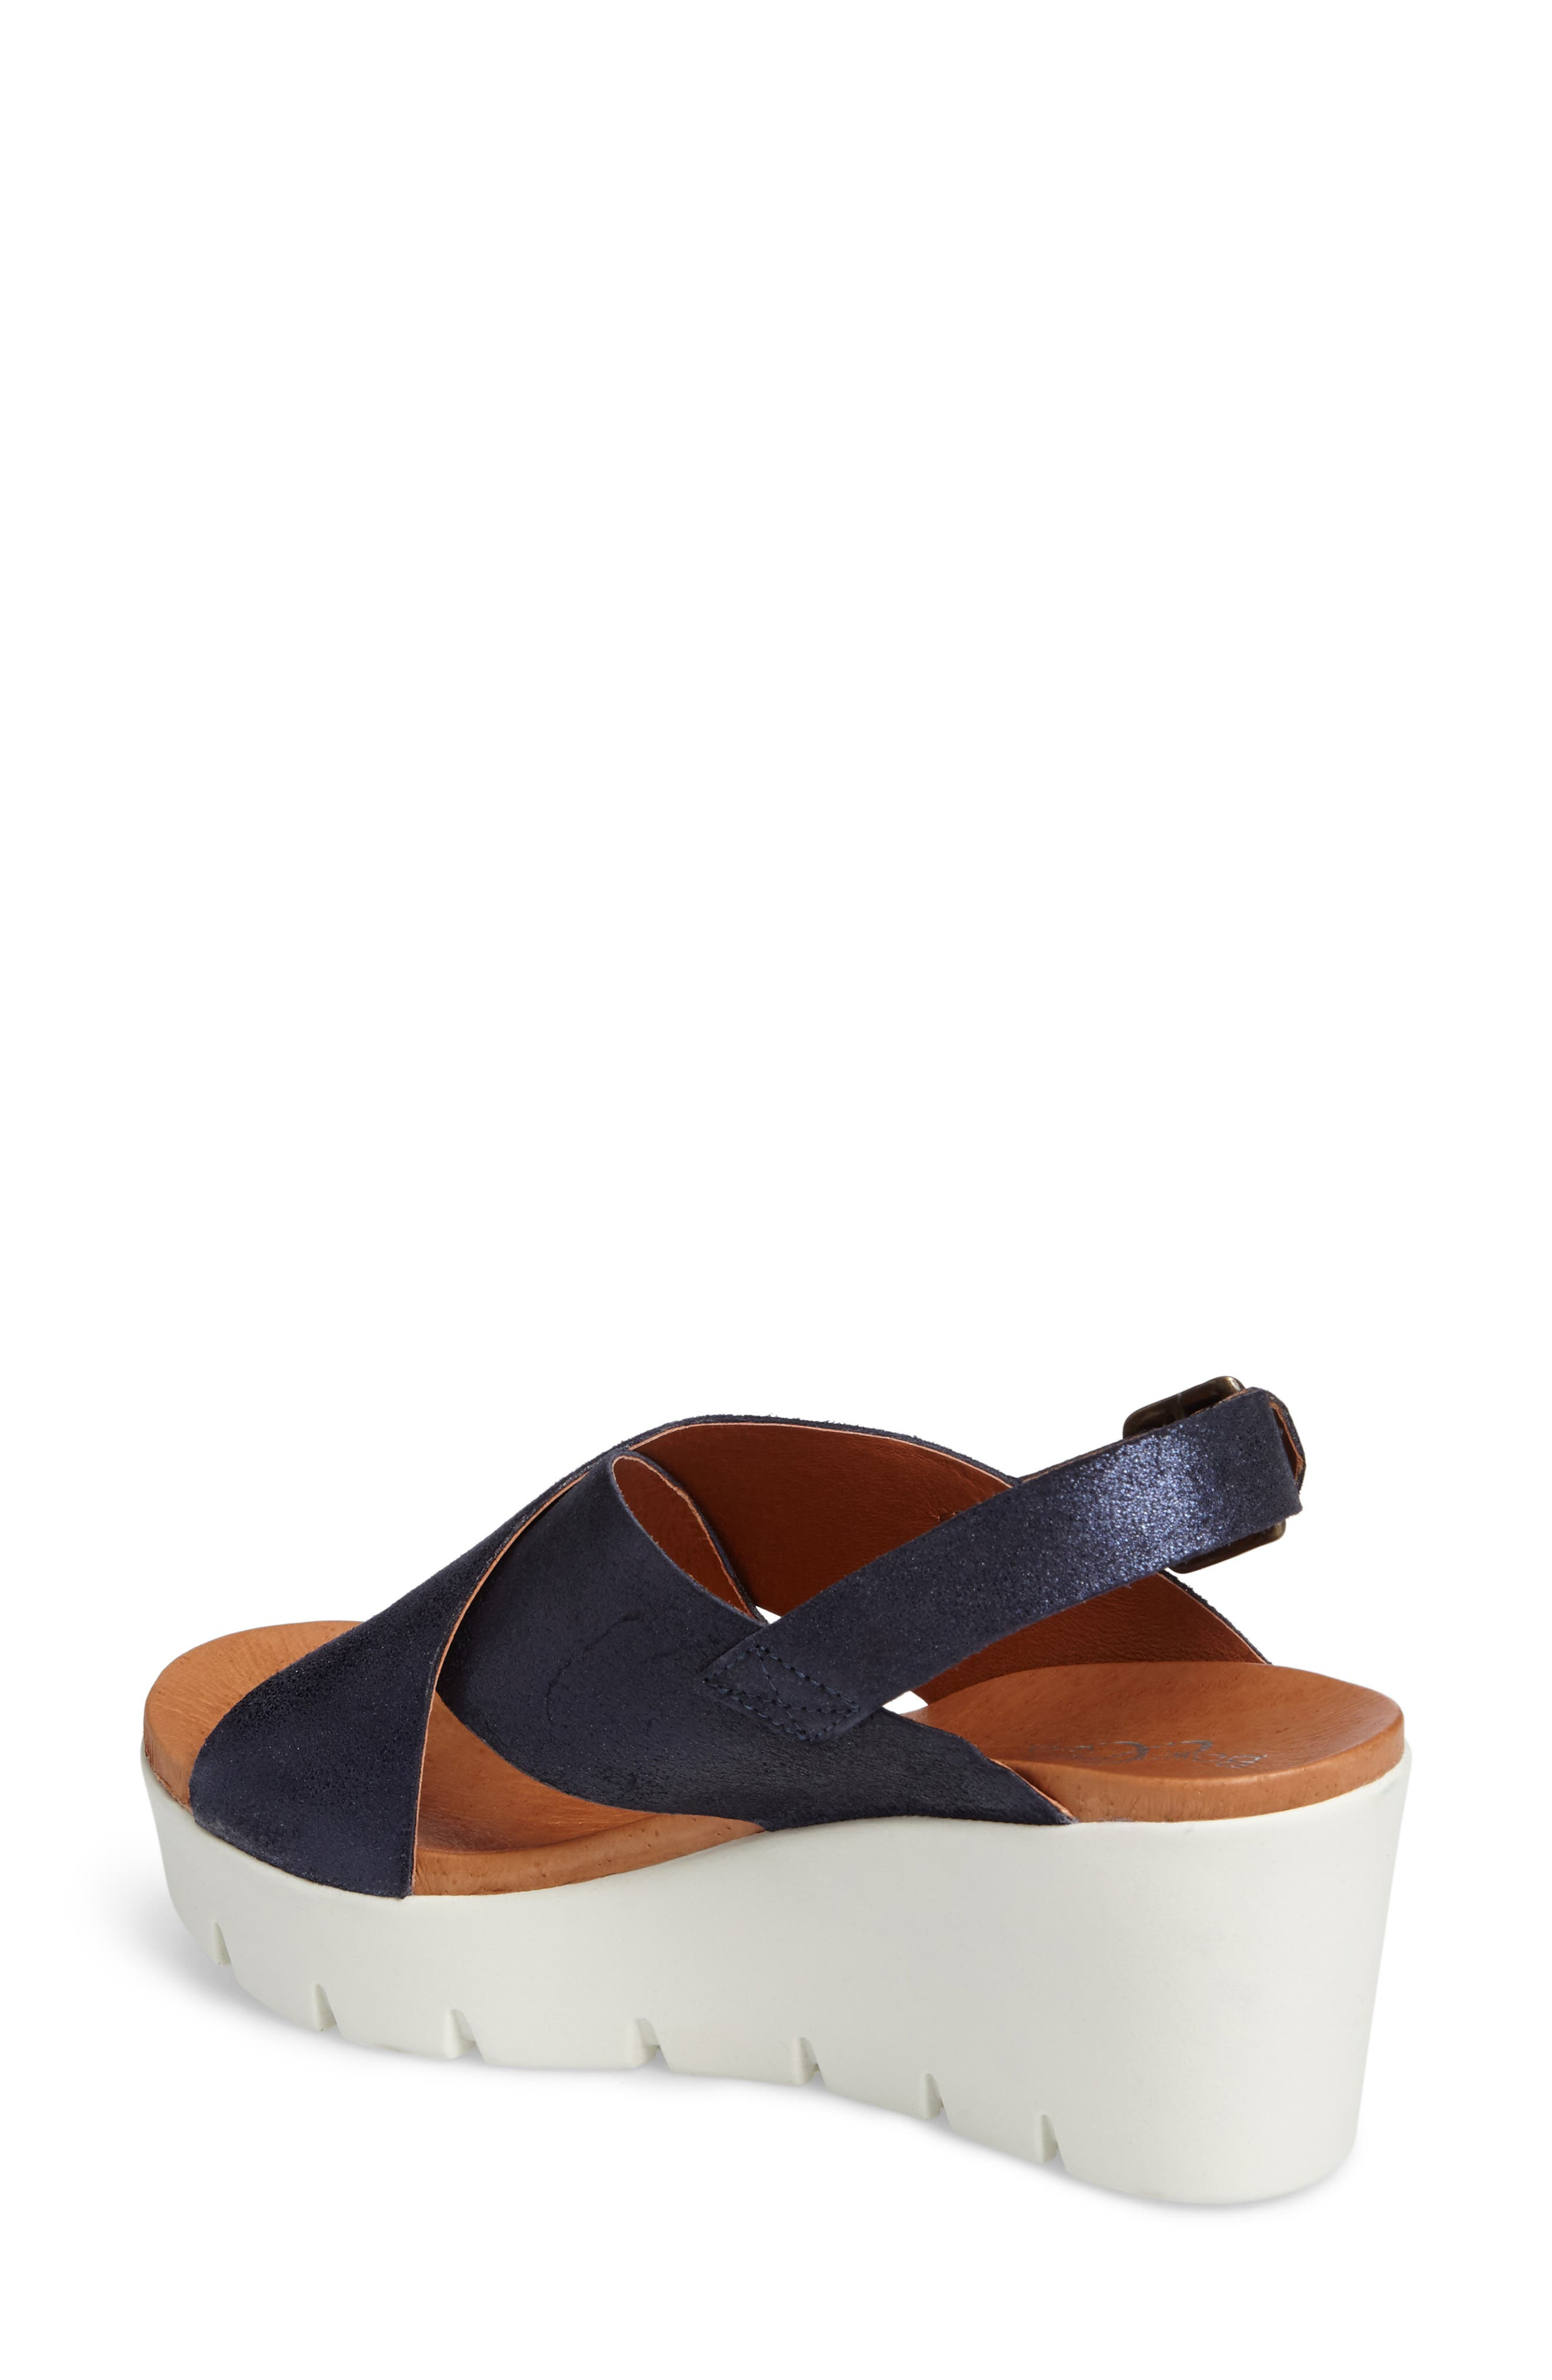 Payton Platform Wedge Sandal,                             Alternate thumbnail 2, color,                             Navy Glitter Suede